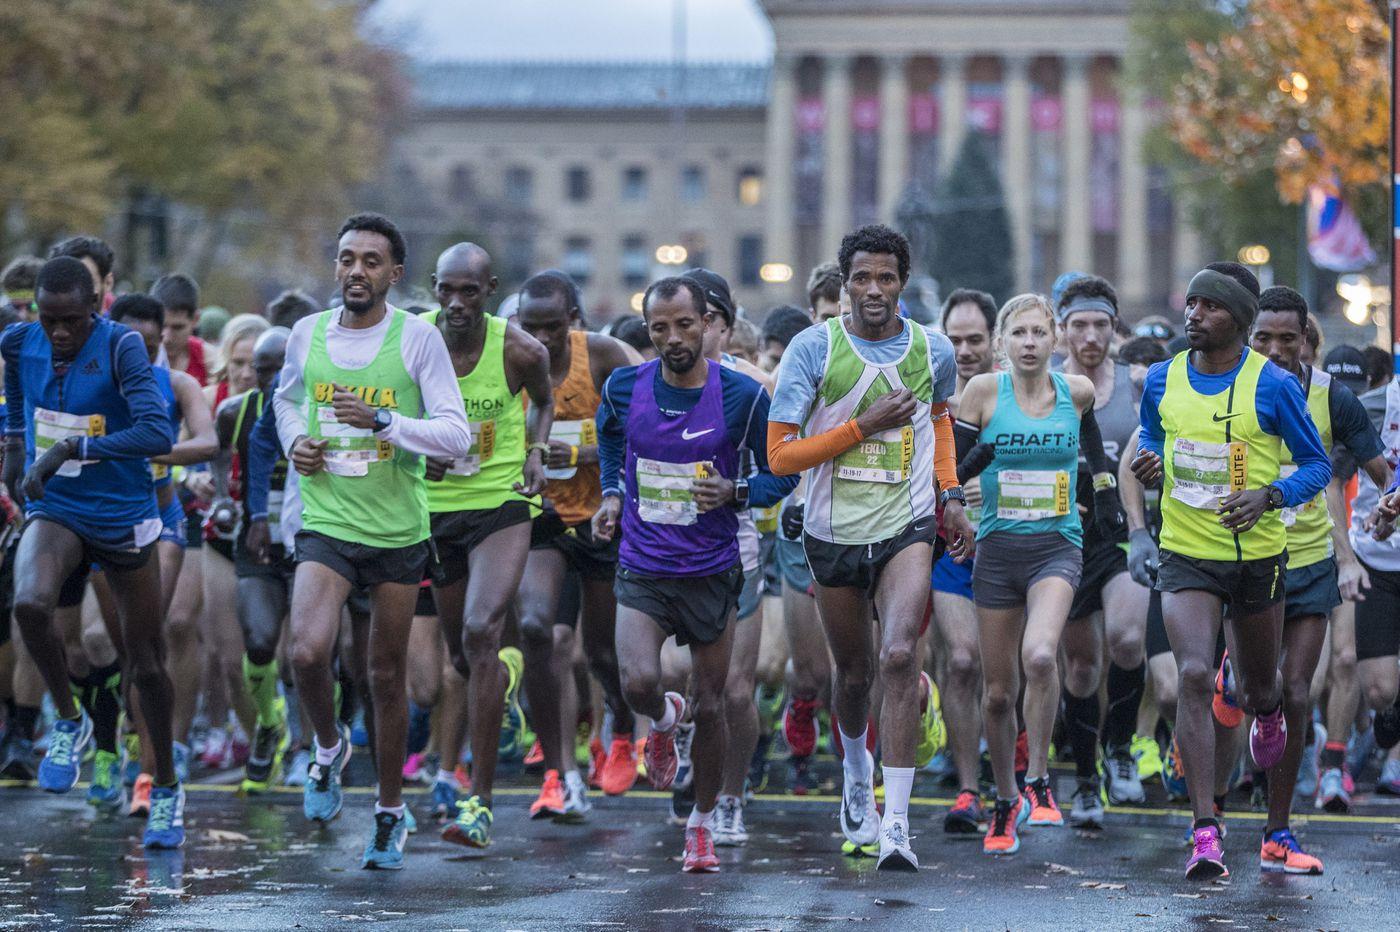 2018 Philadelphia Marathon Weekend road closures